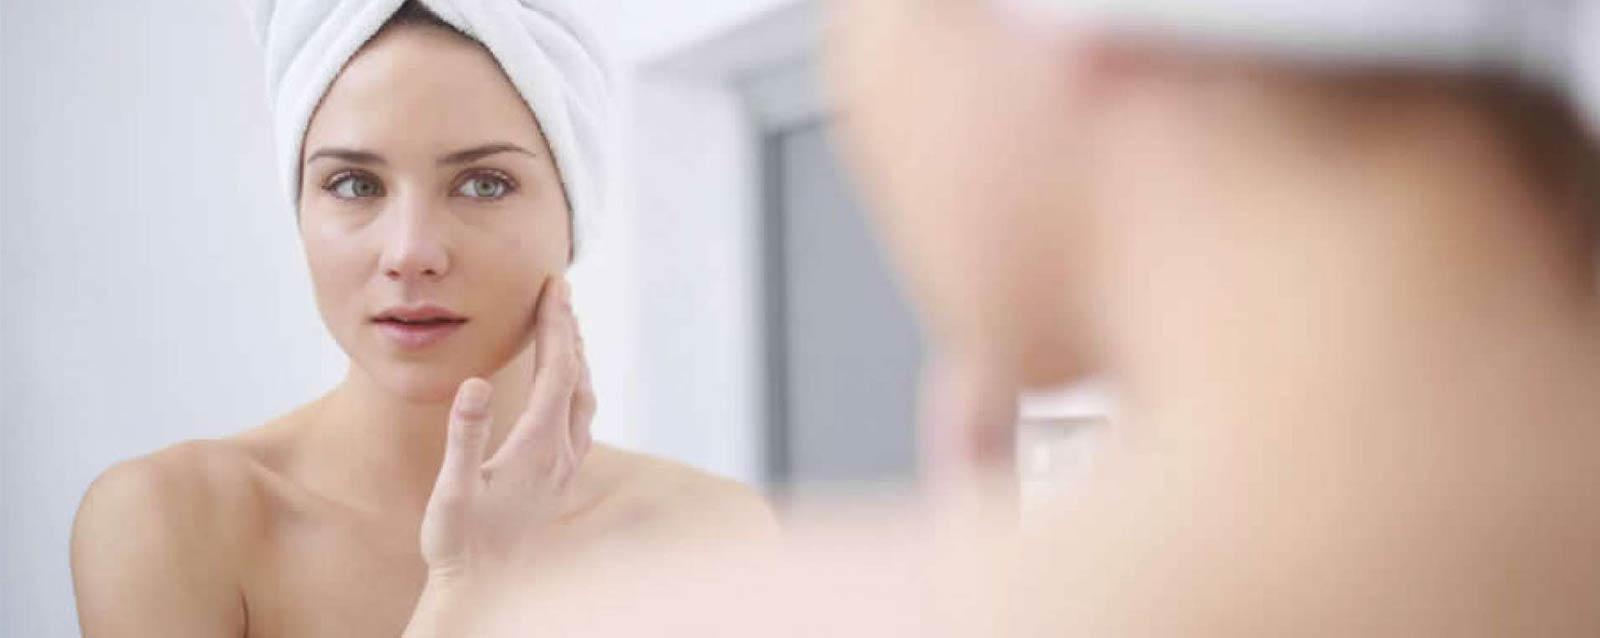 Protocolo: Control Bio Máscara de Argila Equilíbrio da Pele Acneica